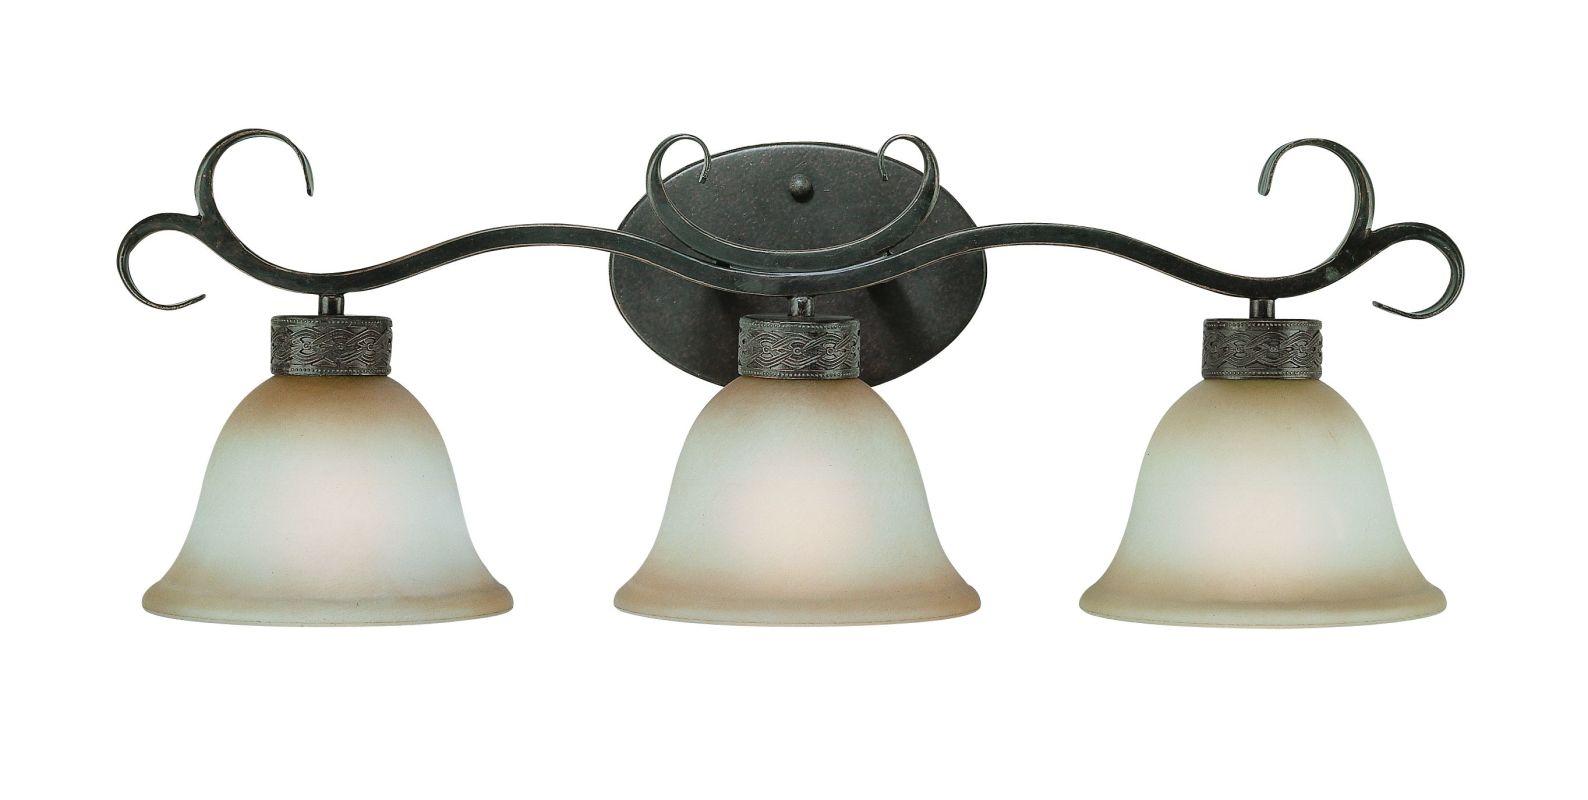 Jeremiah Lighting 23603 Brookshire Manor 3 Light Bathroom Vanity Light